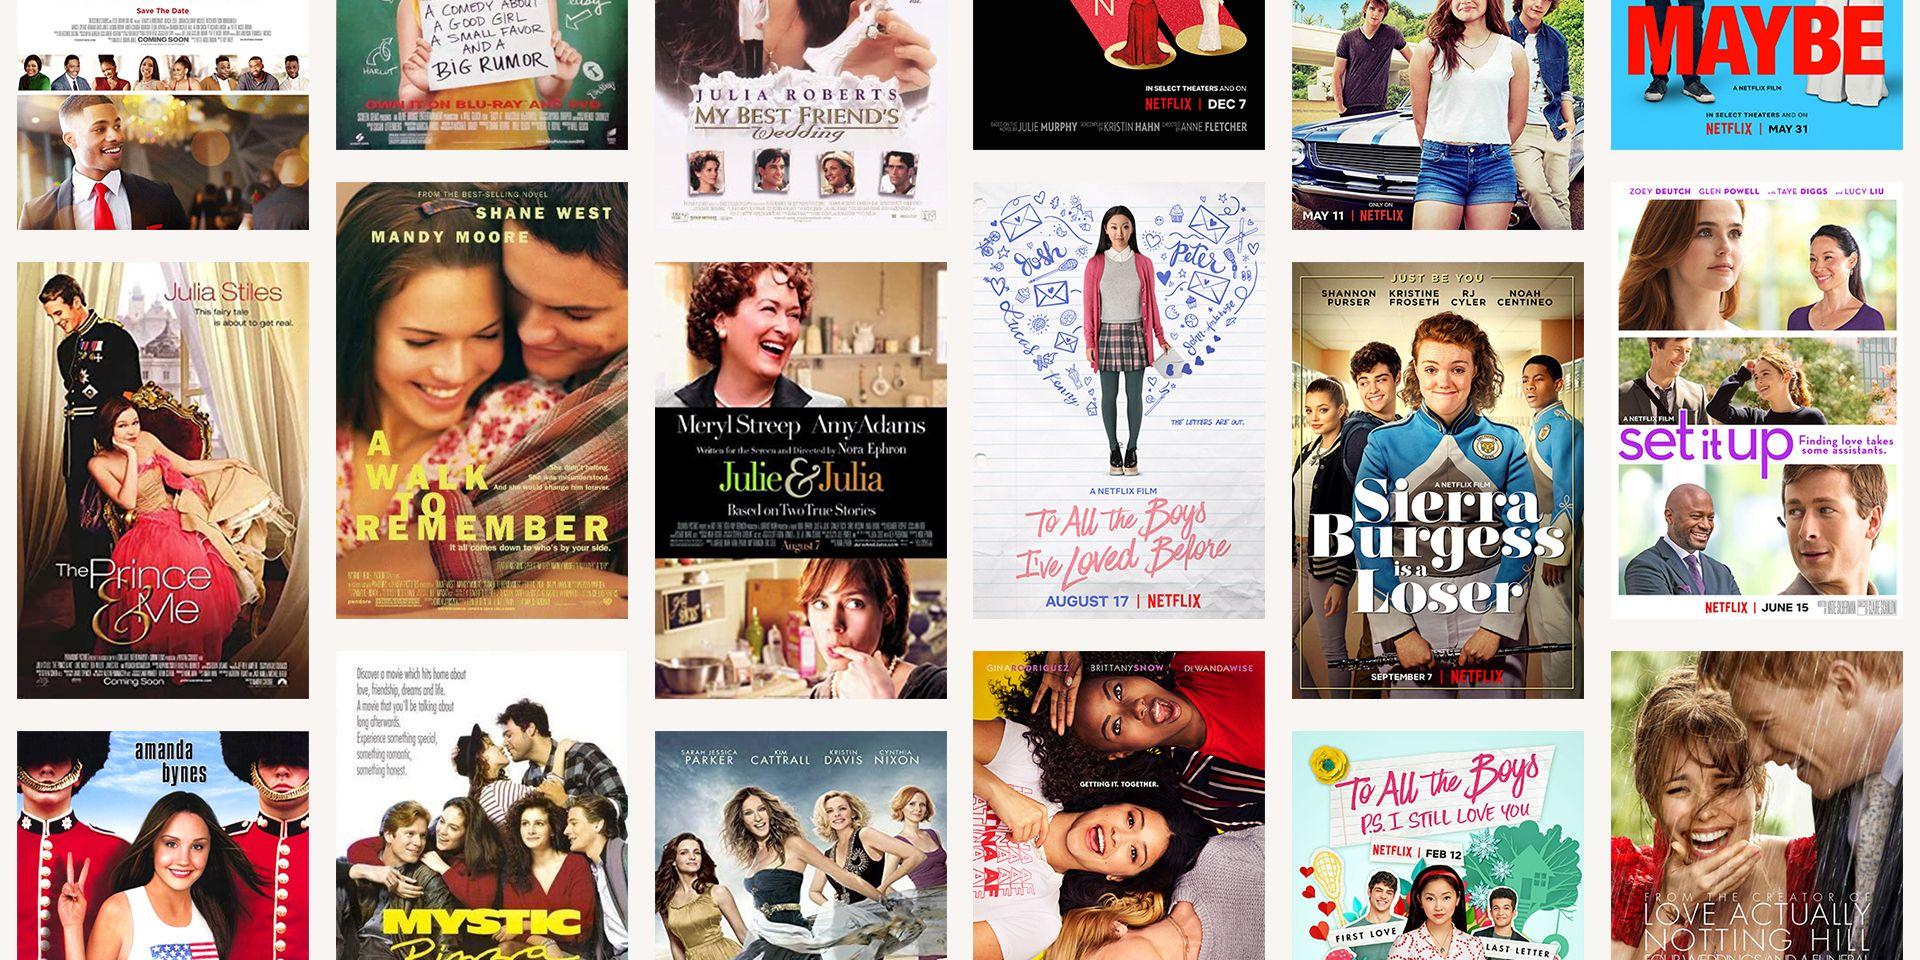 20 Best Chick Flicks On Netflix To Stream This Month